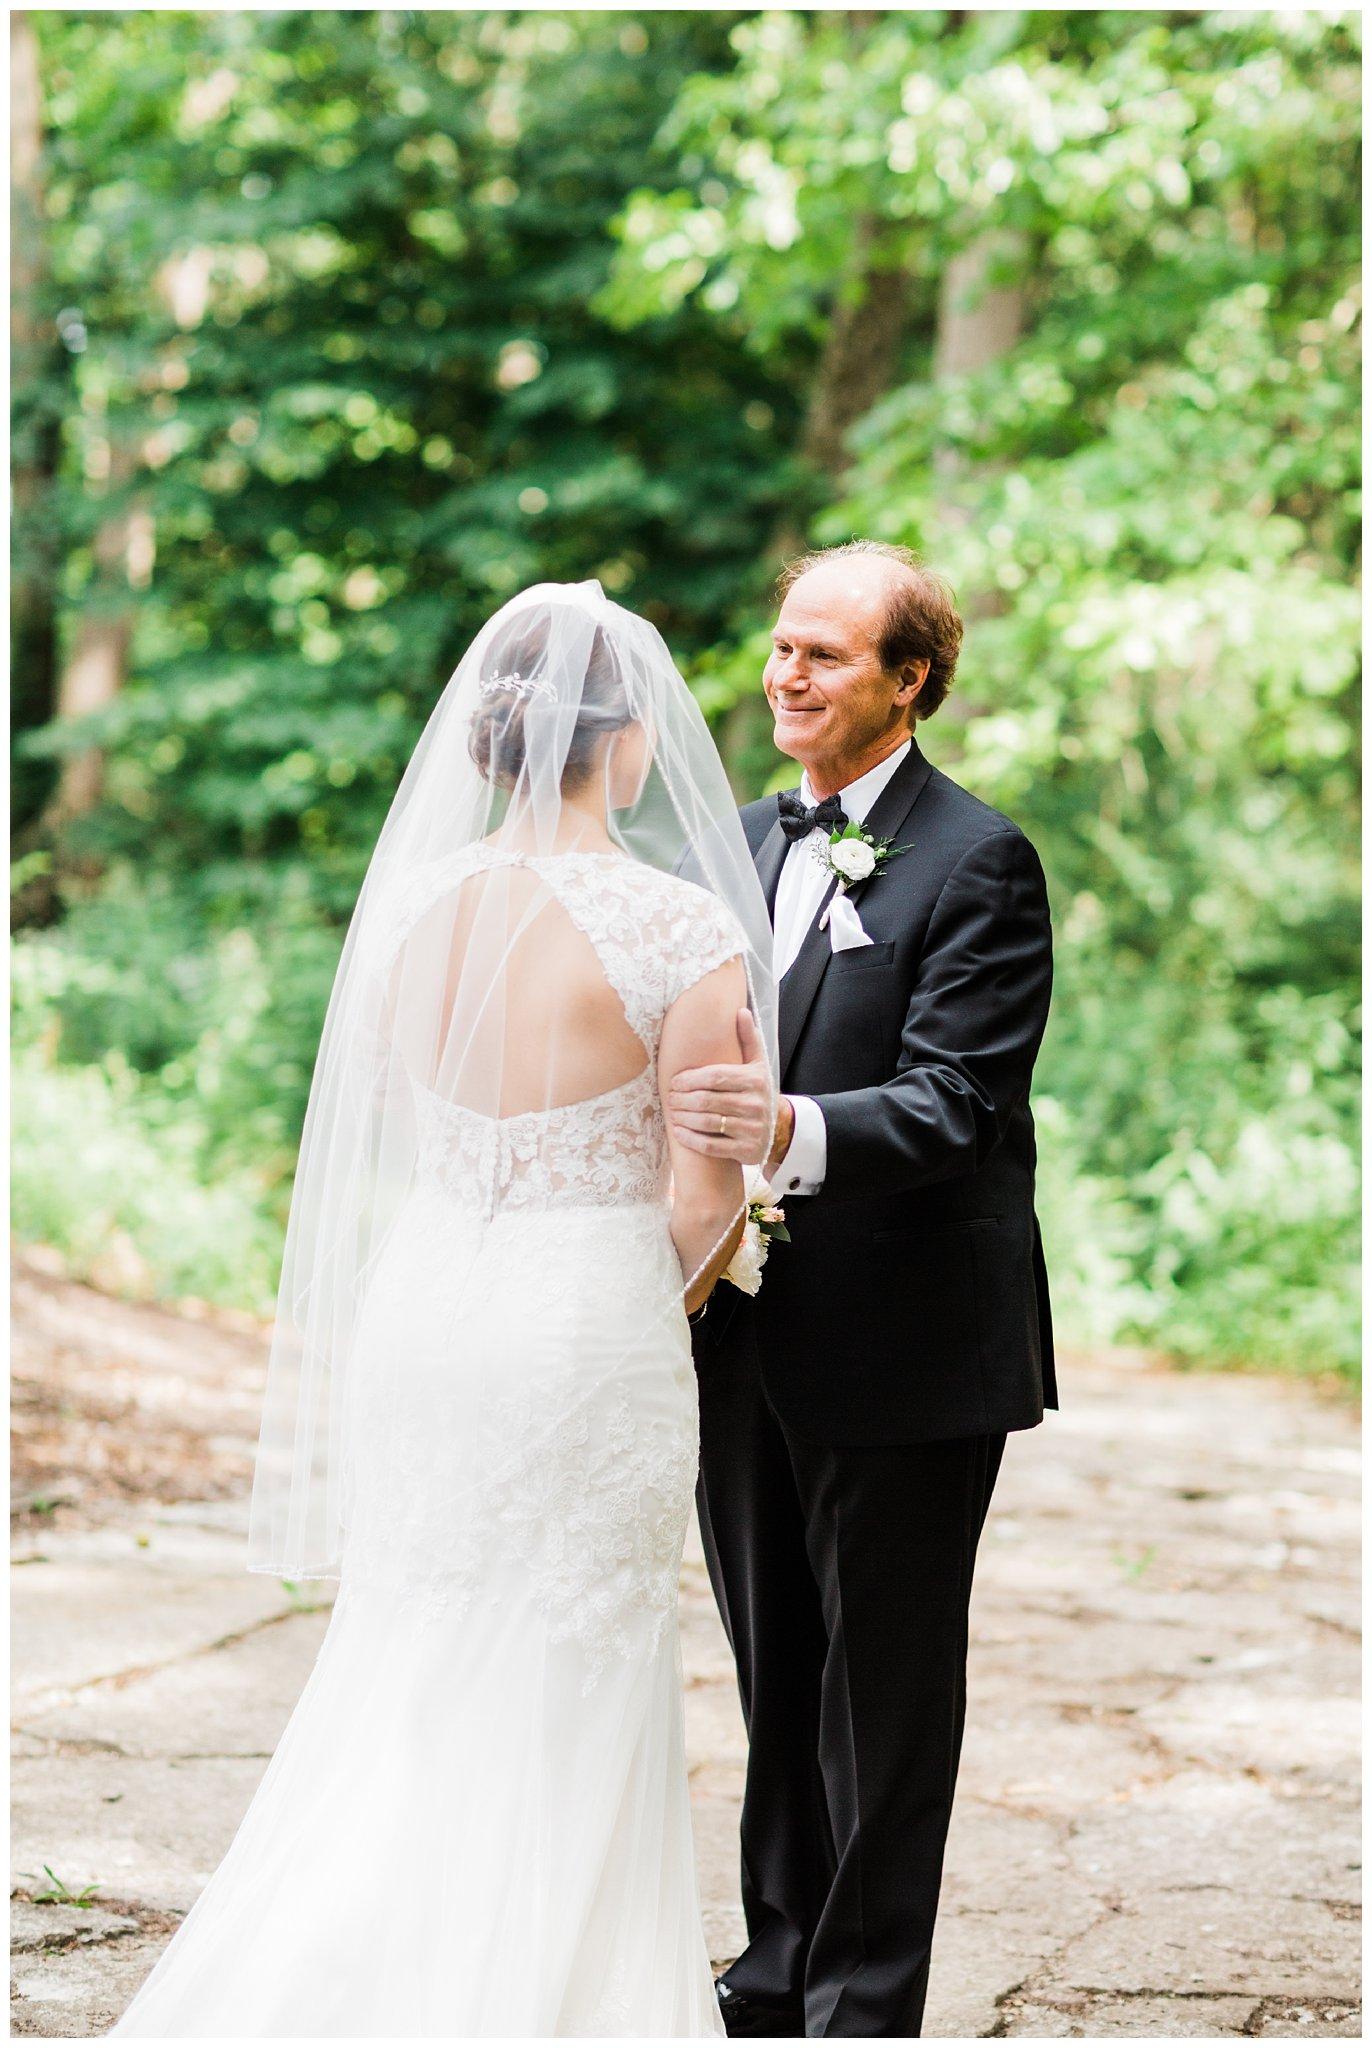 Alicia&Kurt_RavisloeCountryClubWedding_Chicagoweddingphotographer_RebeccaHaleyPhotography_0140.jpg